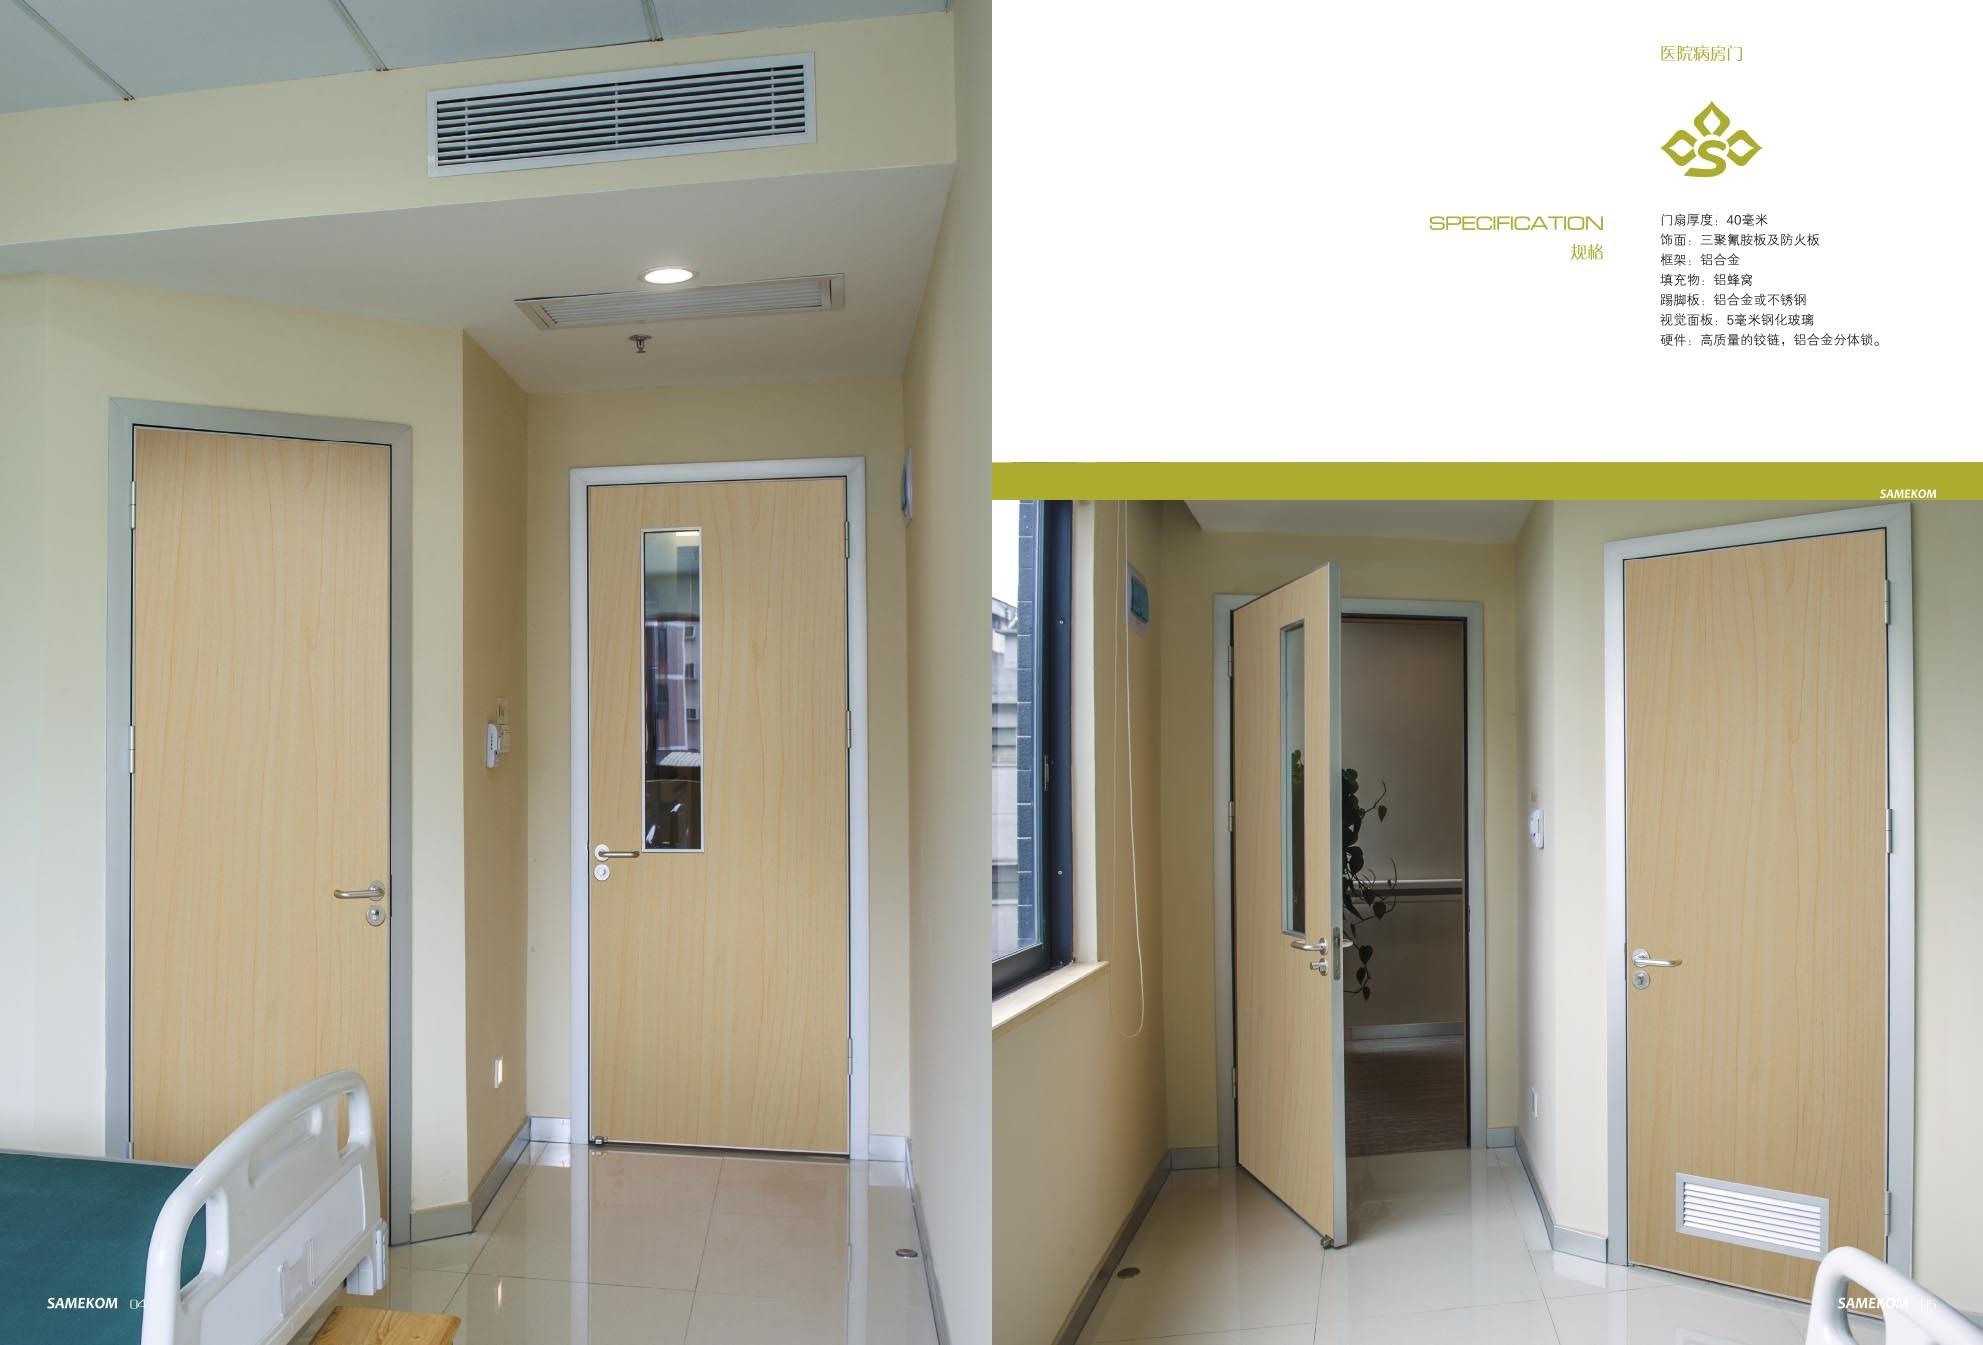 Foto de El bastidor de aluminio de diseño del Hospital Puerta de ...